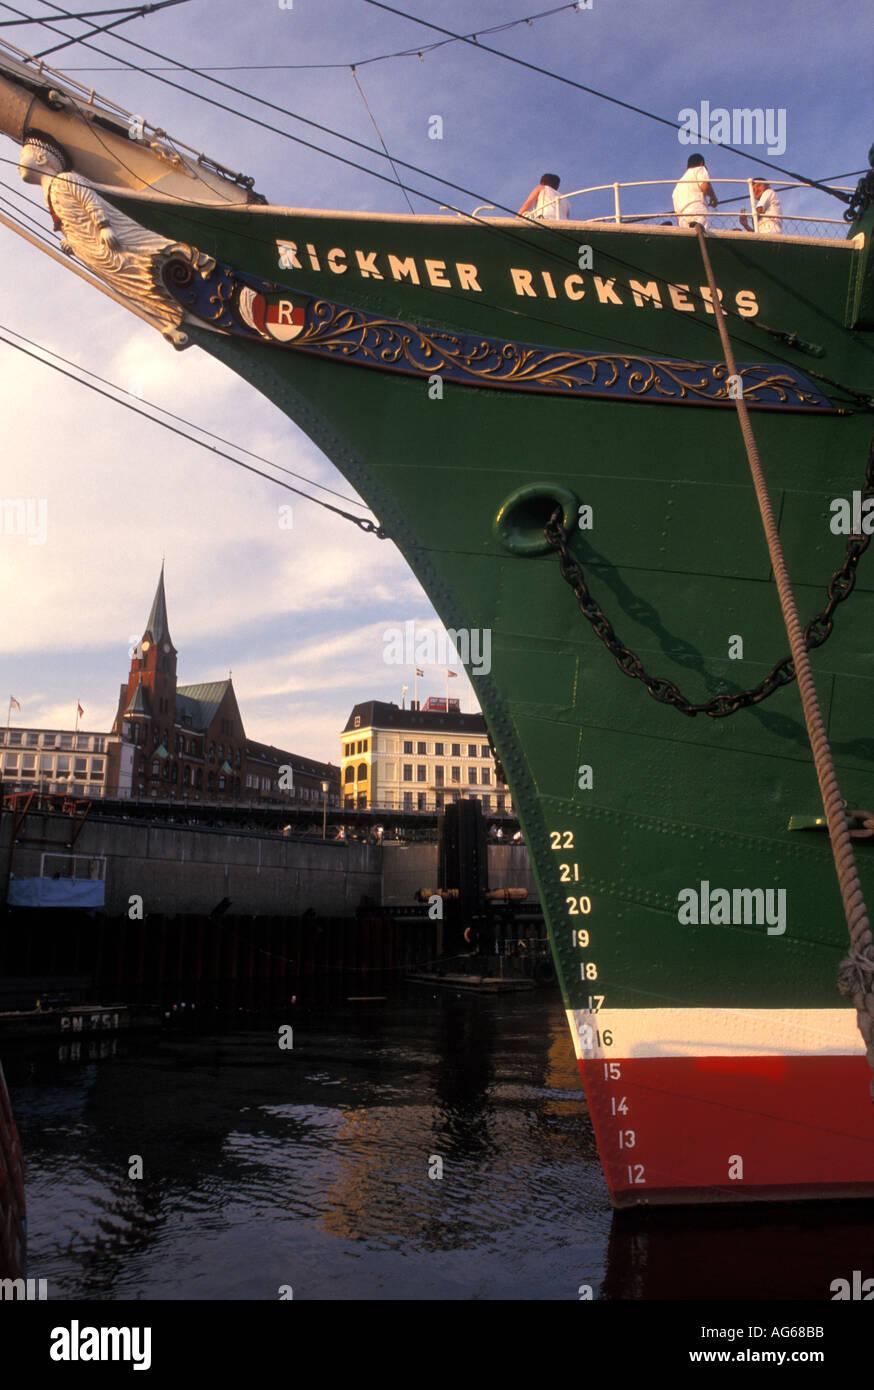 A J Hamburg aj17220 hamburg germany europe stock photo 1075386 alamy